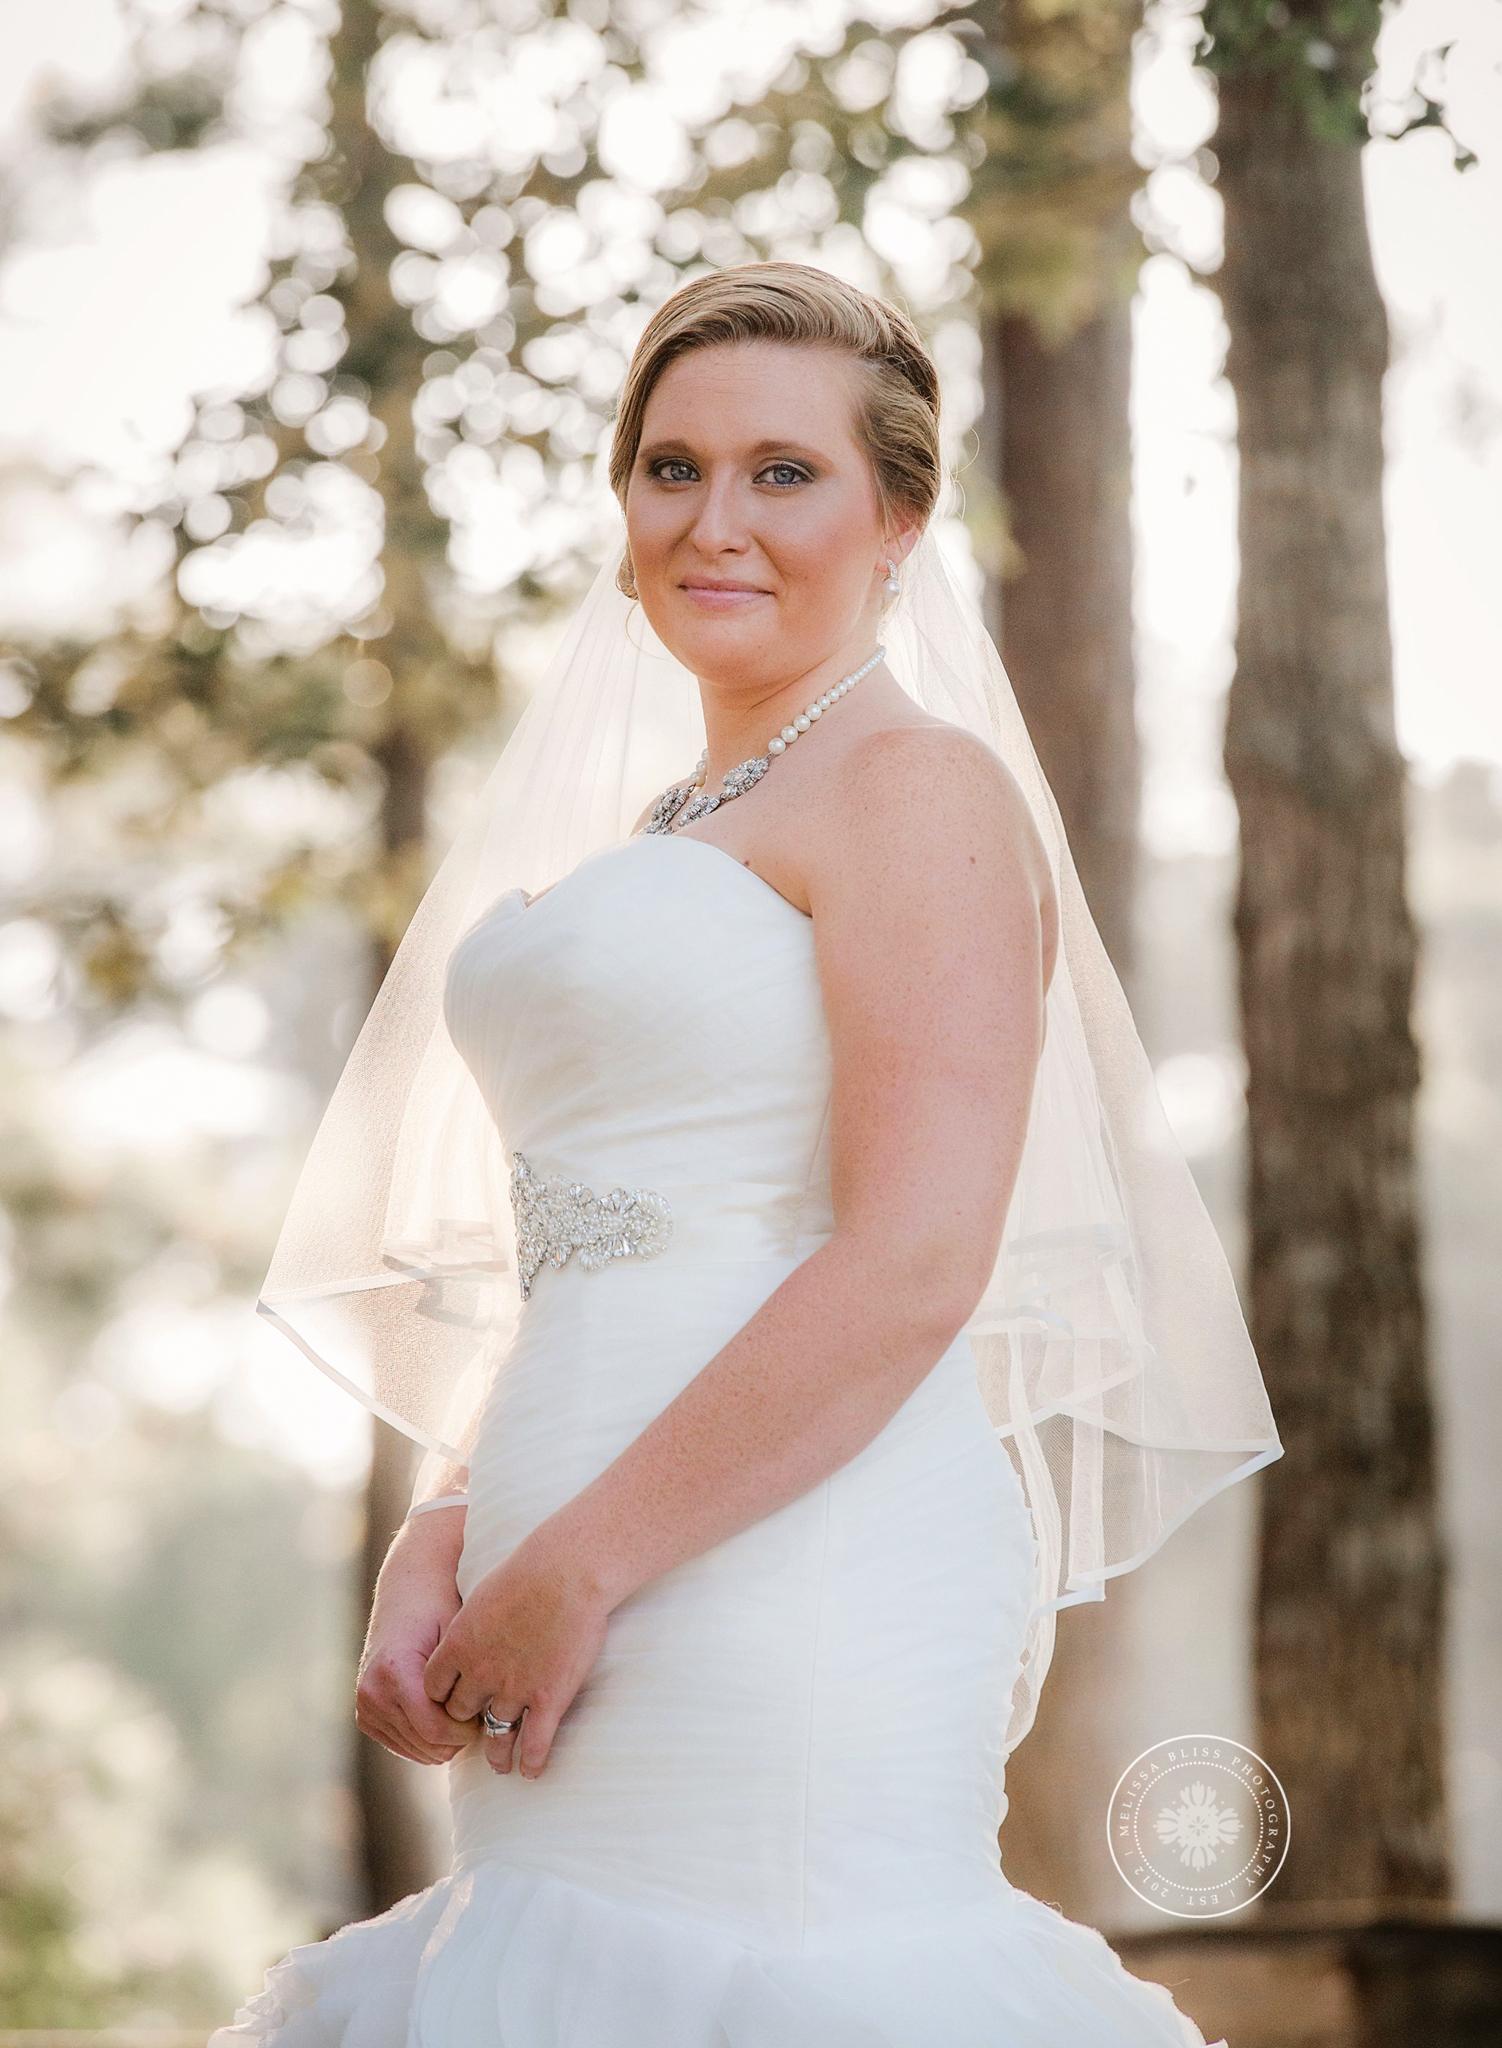 bride-portrait-virginia-wedding-photographers-melissa-bliss-photography-outdoor-wedding-inspiration-norfolk-williamsburg-virginia-beach-weddings